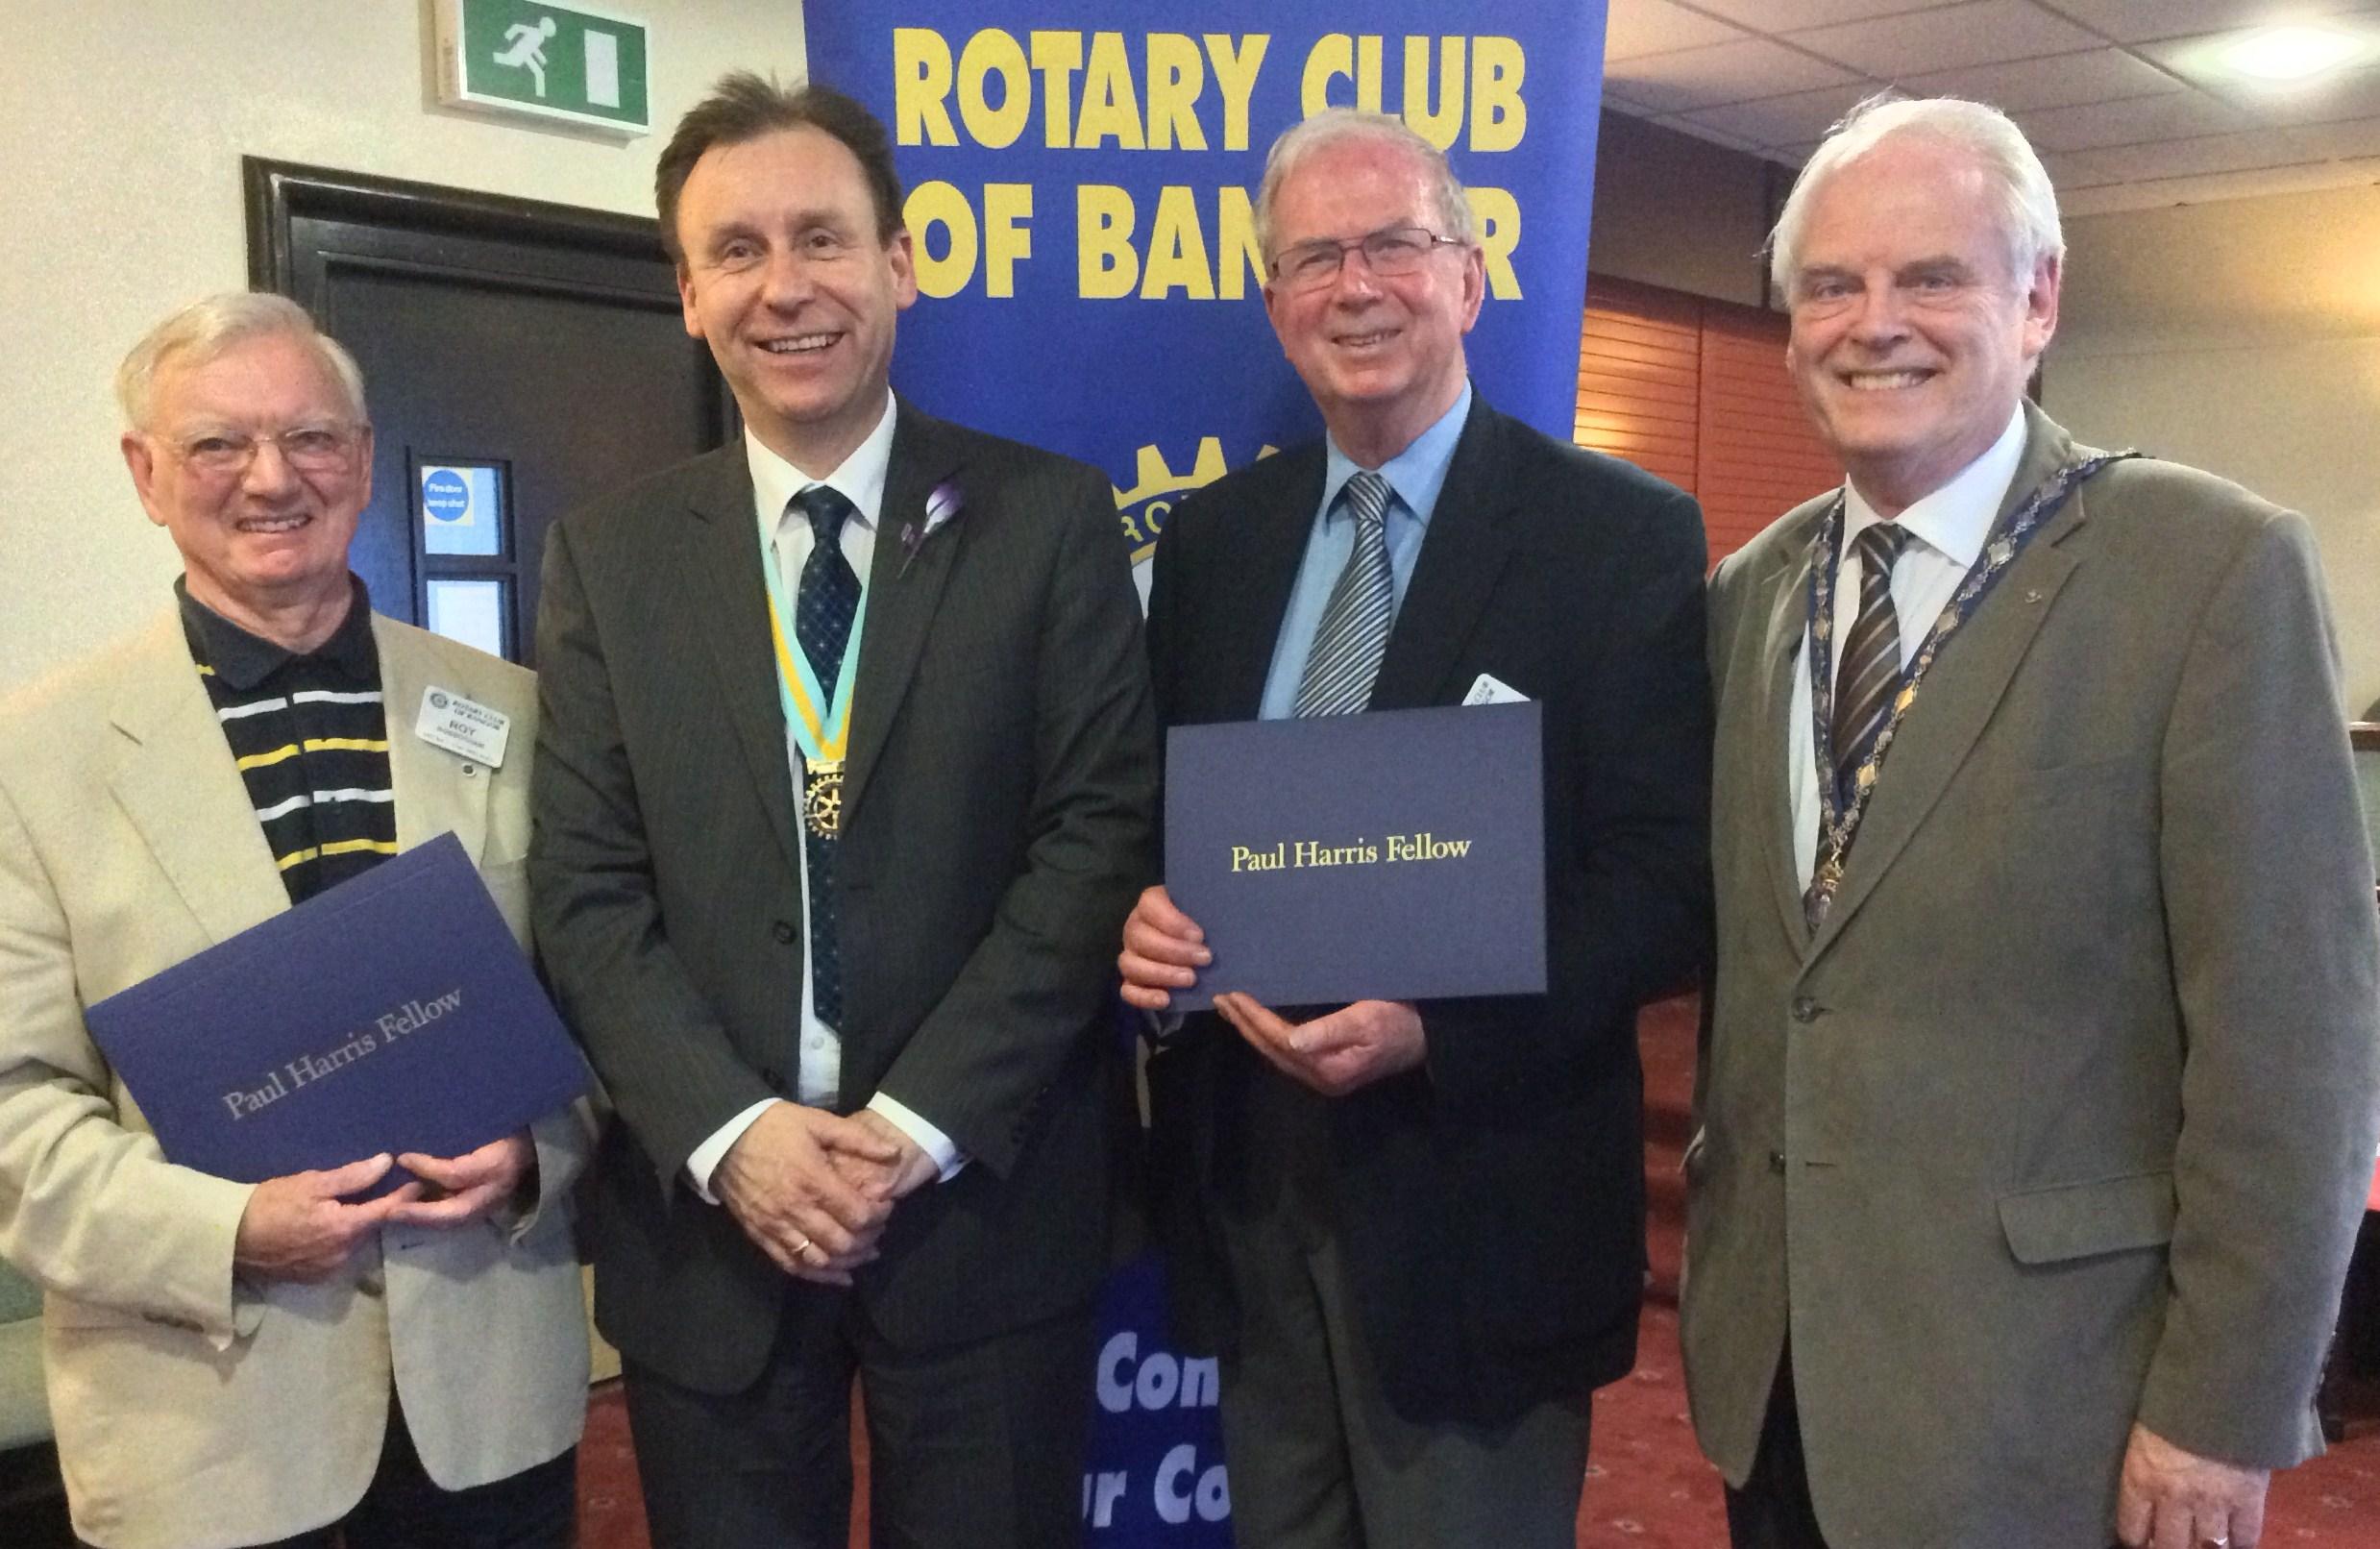 Roy Rosbotham, AG Garth Arnold, Stanley Smith and President Robin Mussen